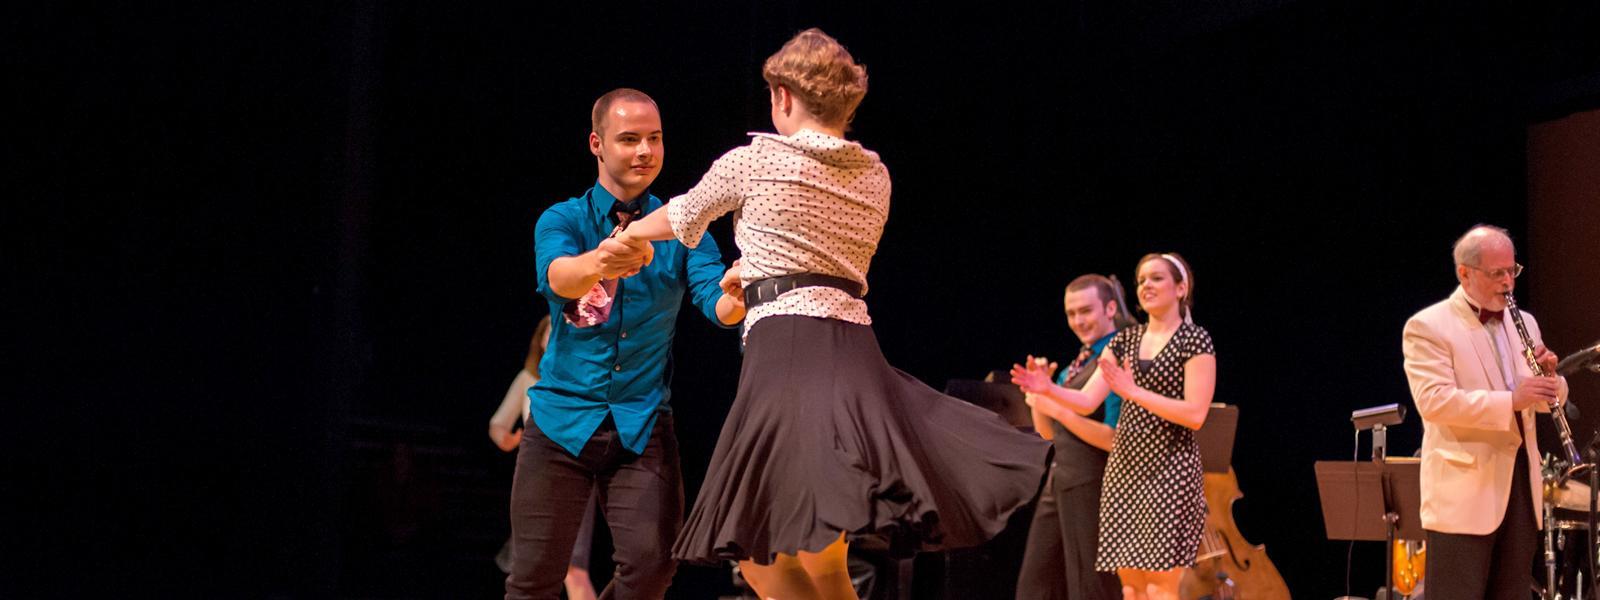 Dancers at the UNCSA Jazz Ensemble Swing Era Concert / Photo: S.D. Davis